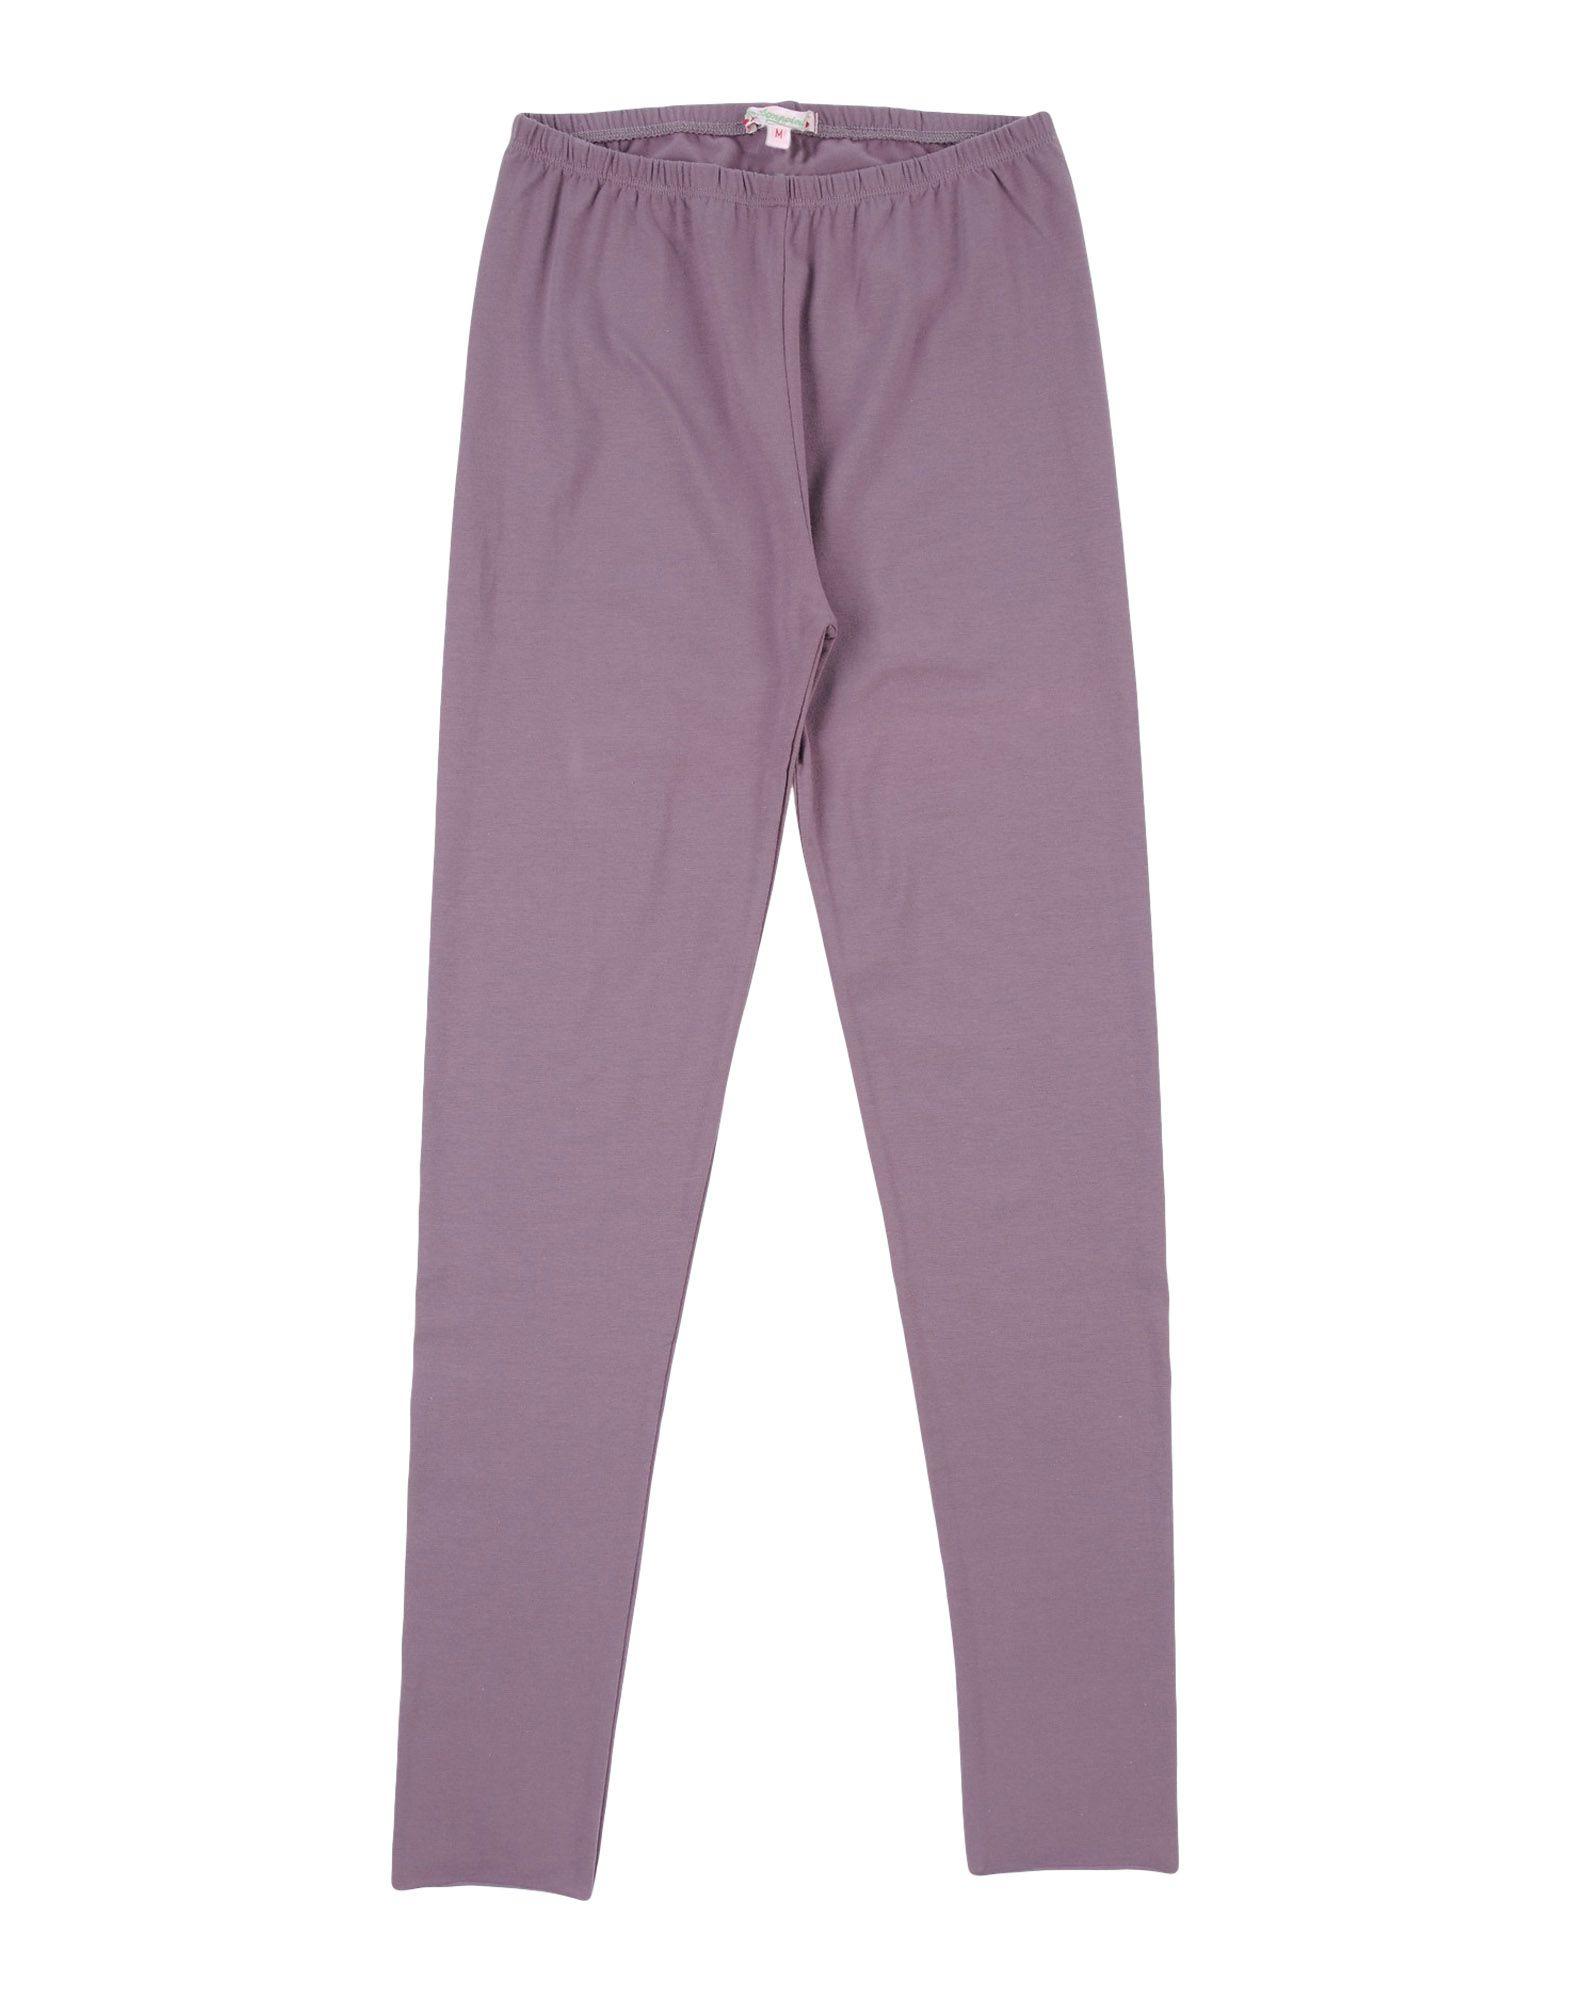 BONPOINT Leggings in Purple